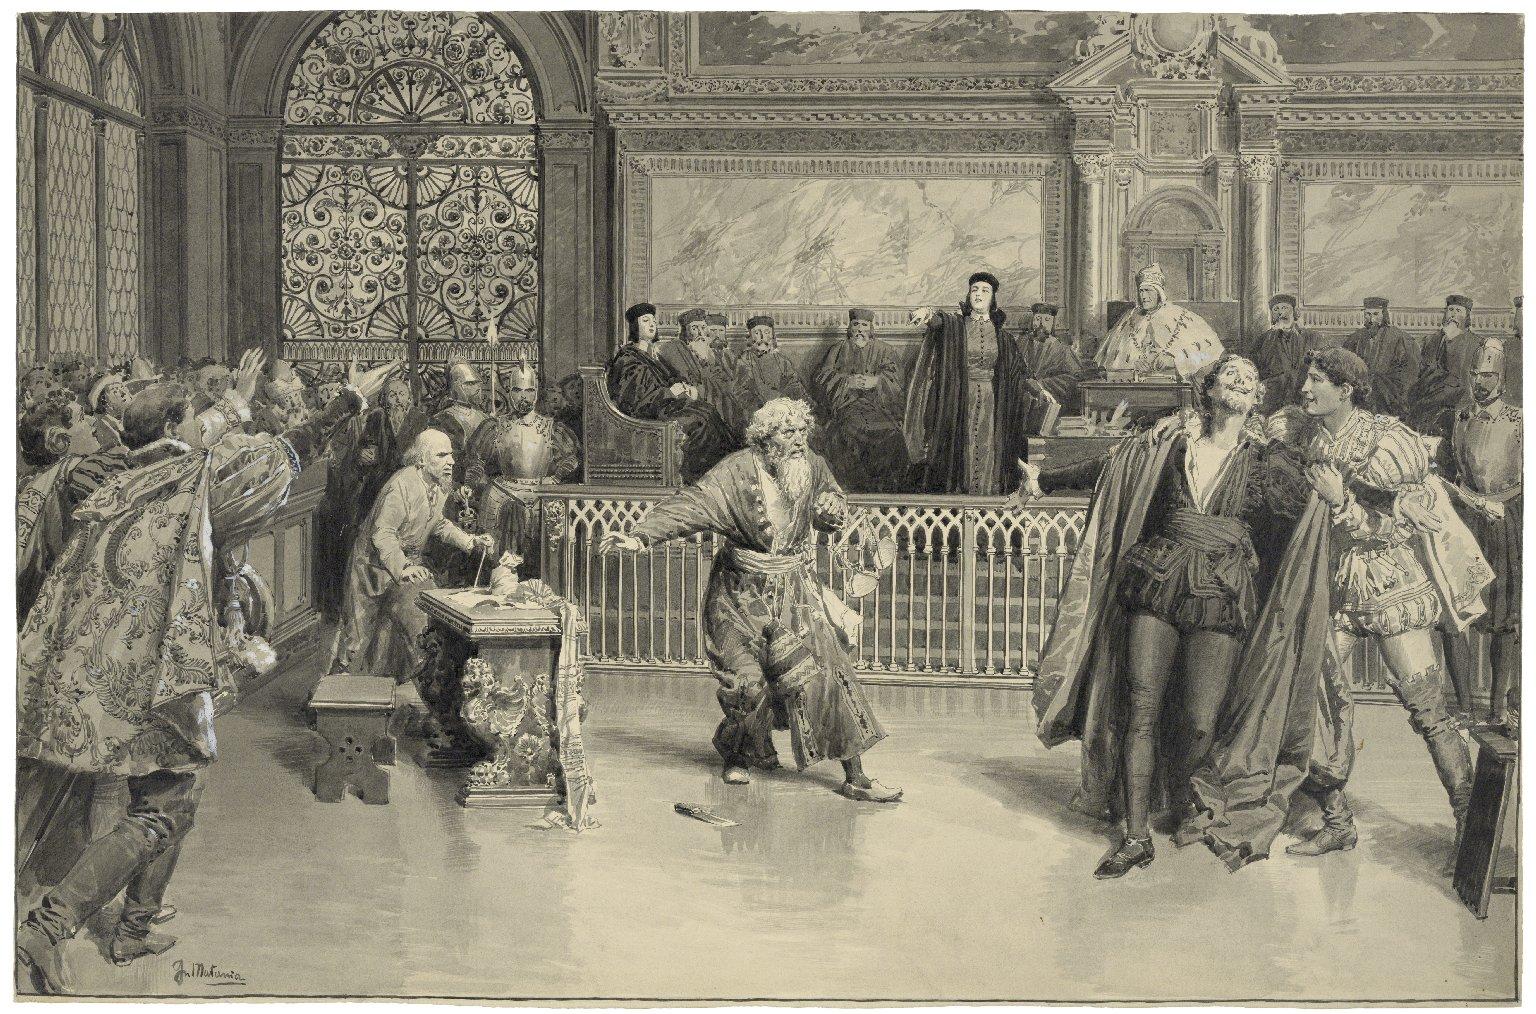 Scene from the Merchant of Venice